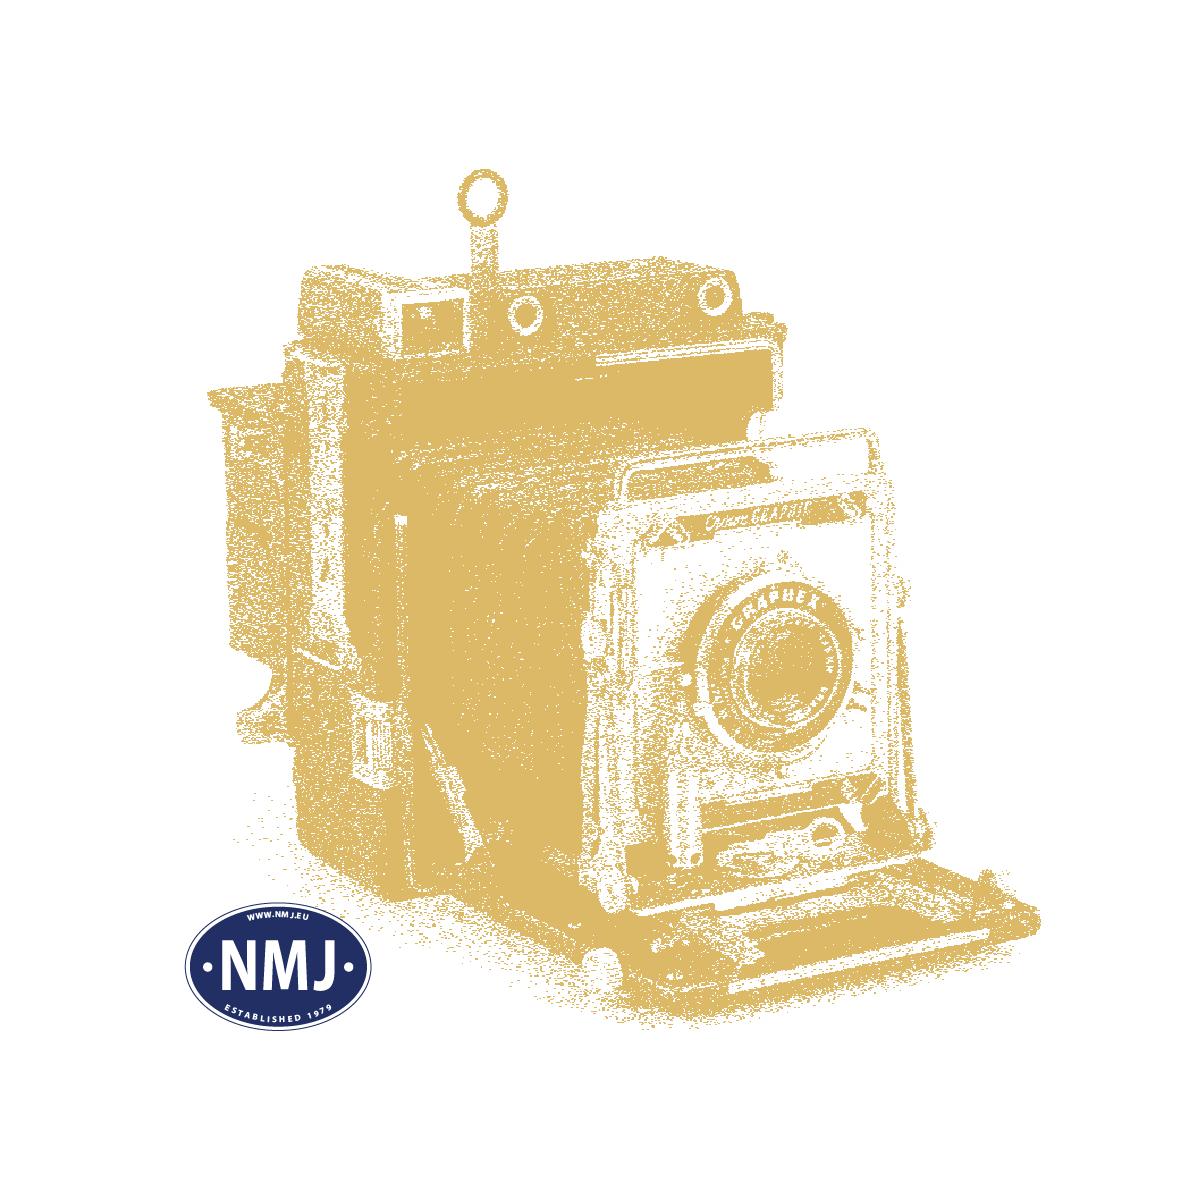 NMJTKAT17 - NMJ Topline og Skyline Katalog 2017